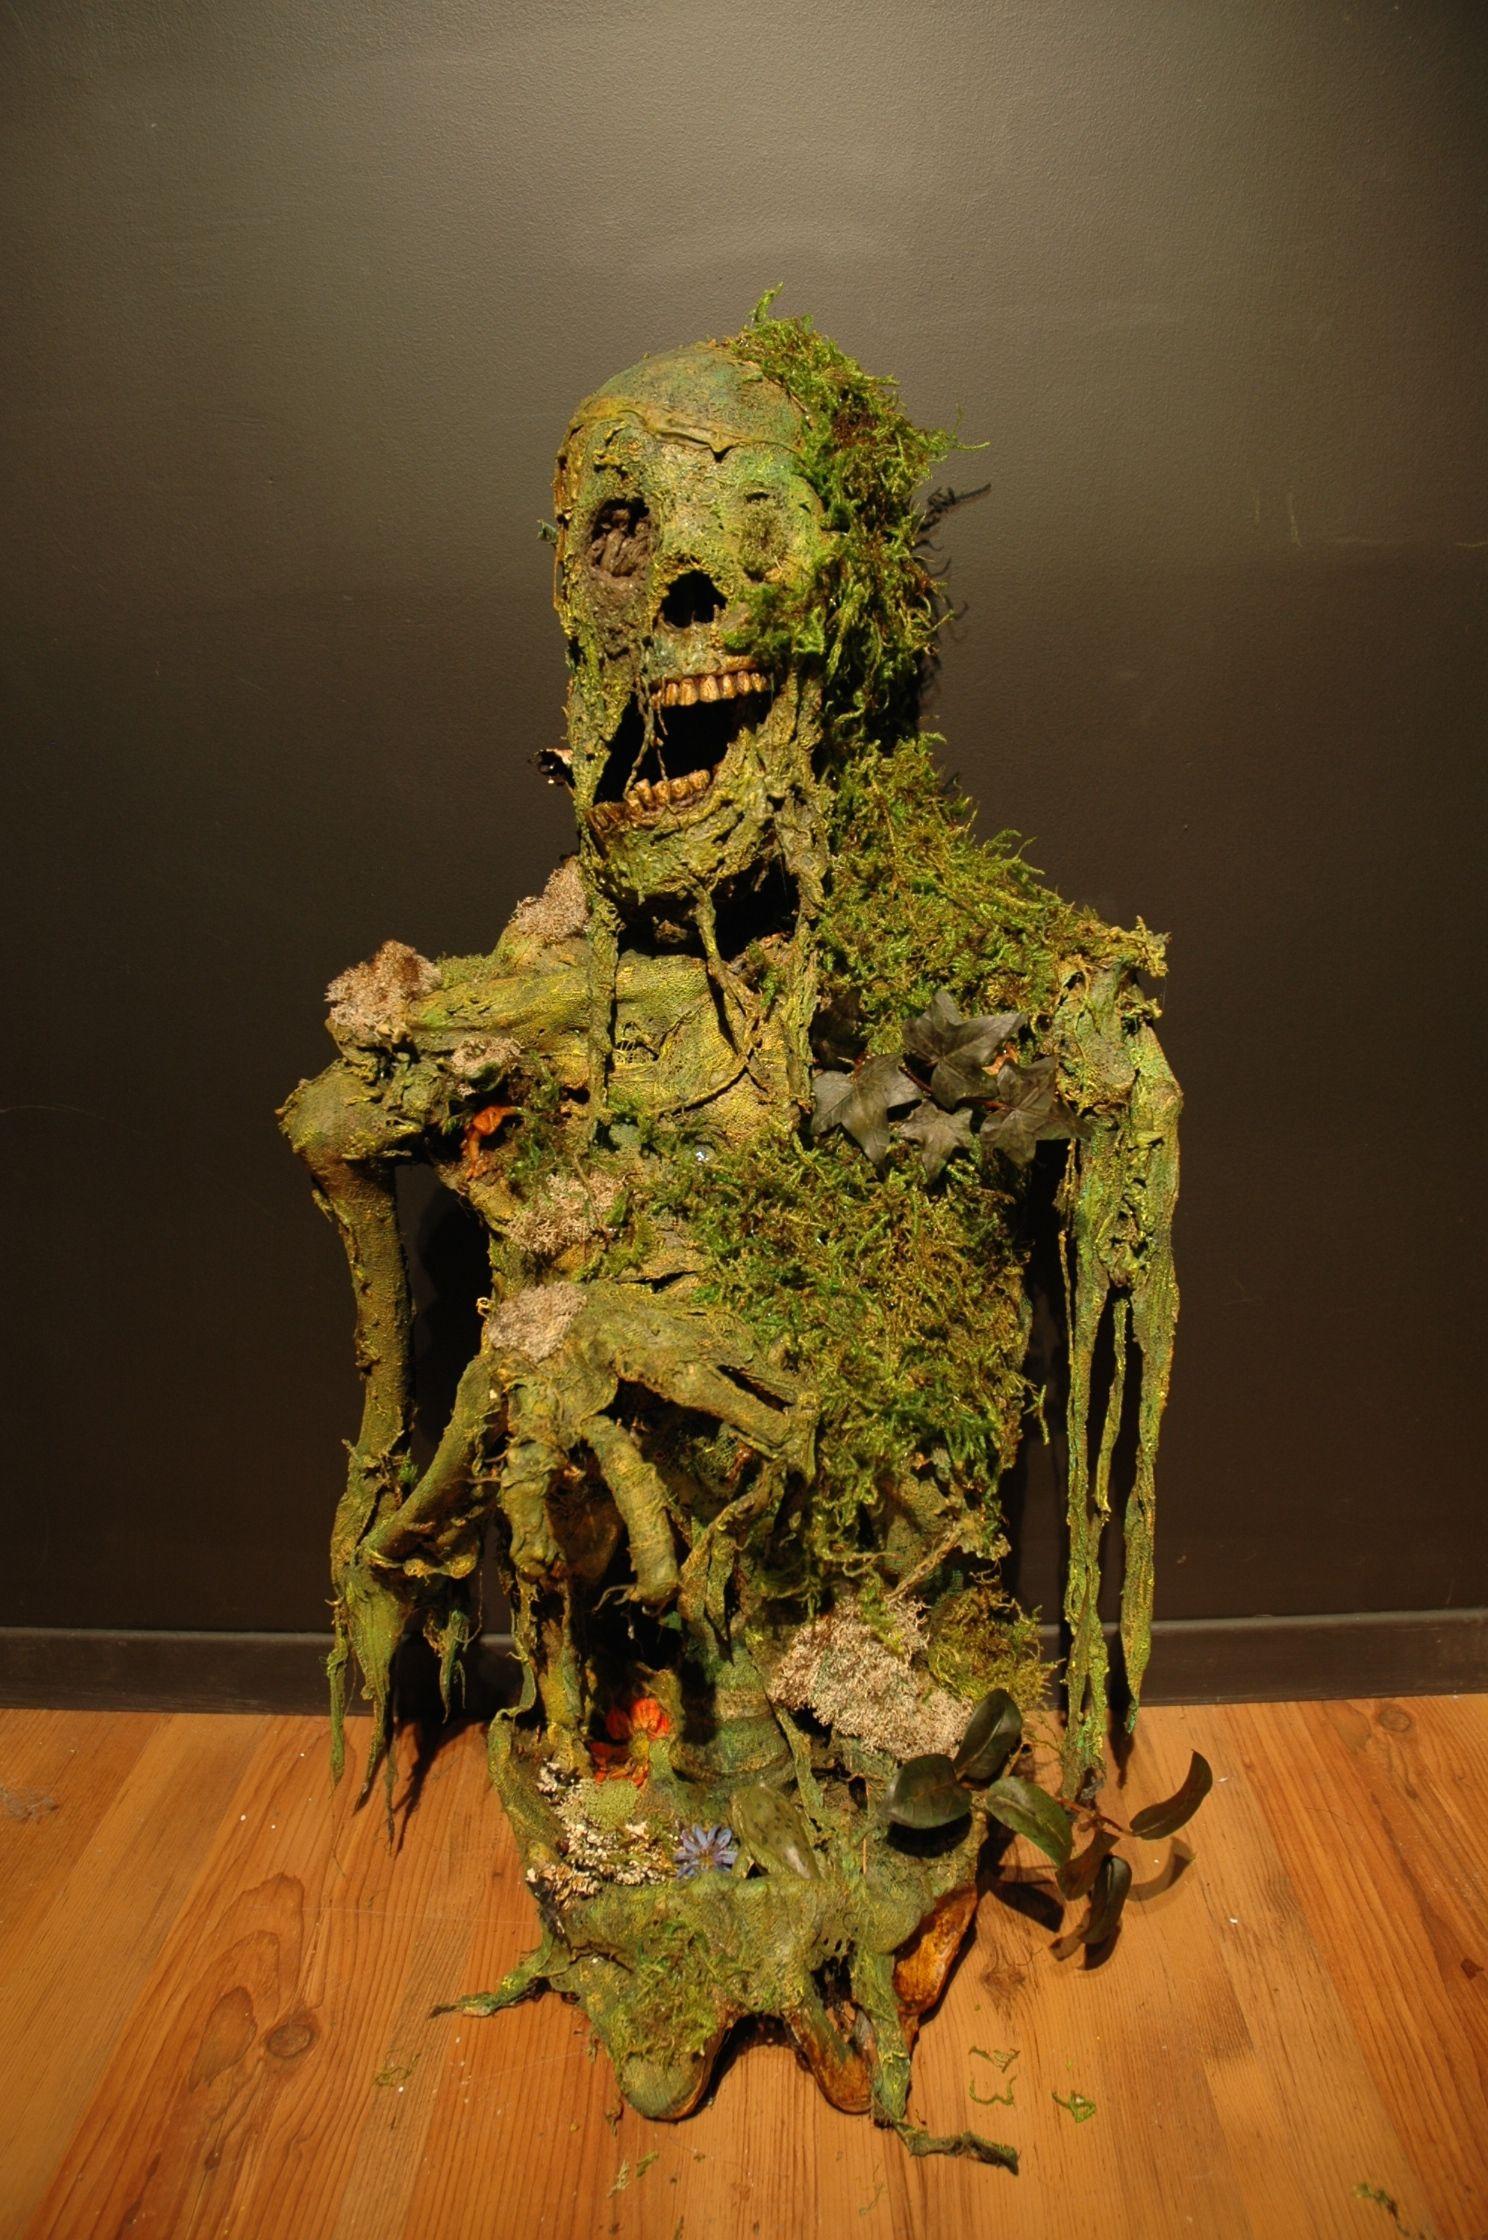 Colin W Laughlin Bucky Skeleton I Corpsed using Latex, Creepy Cloth - diy halloween decorations scary